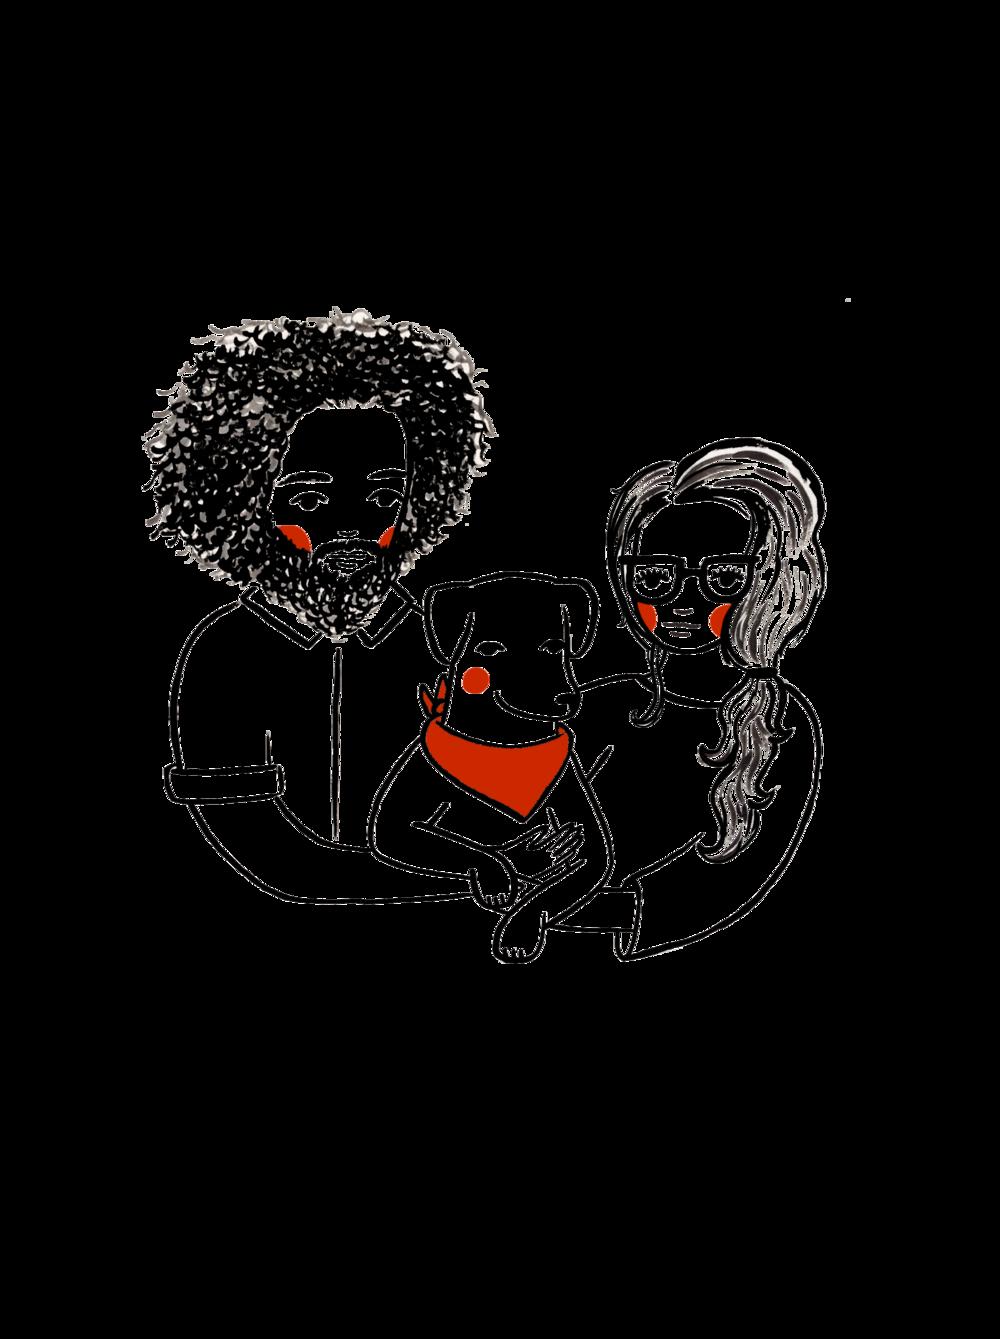 custom hand painted family portrait illustration by em randall